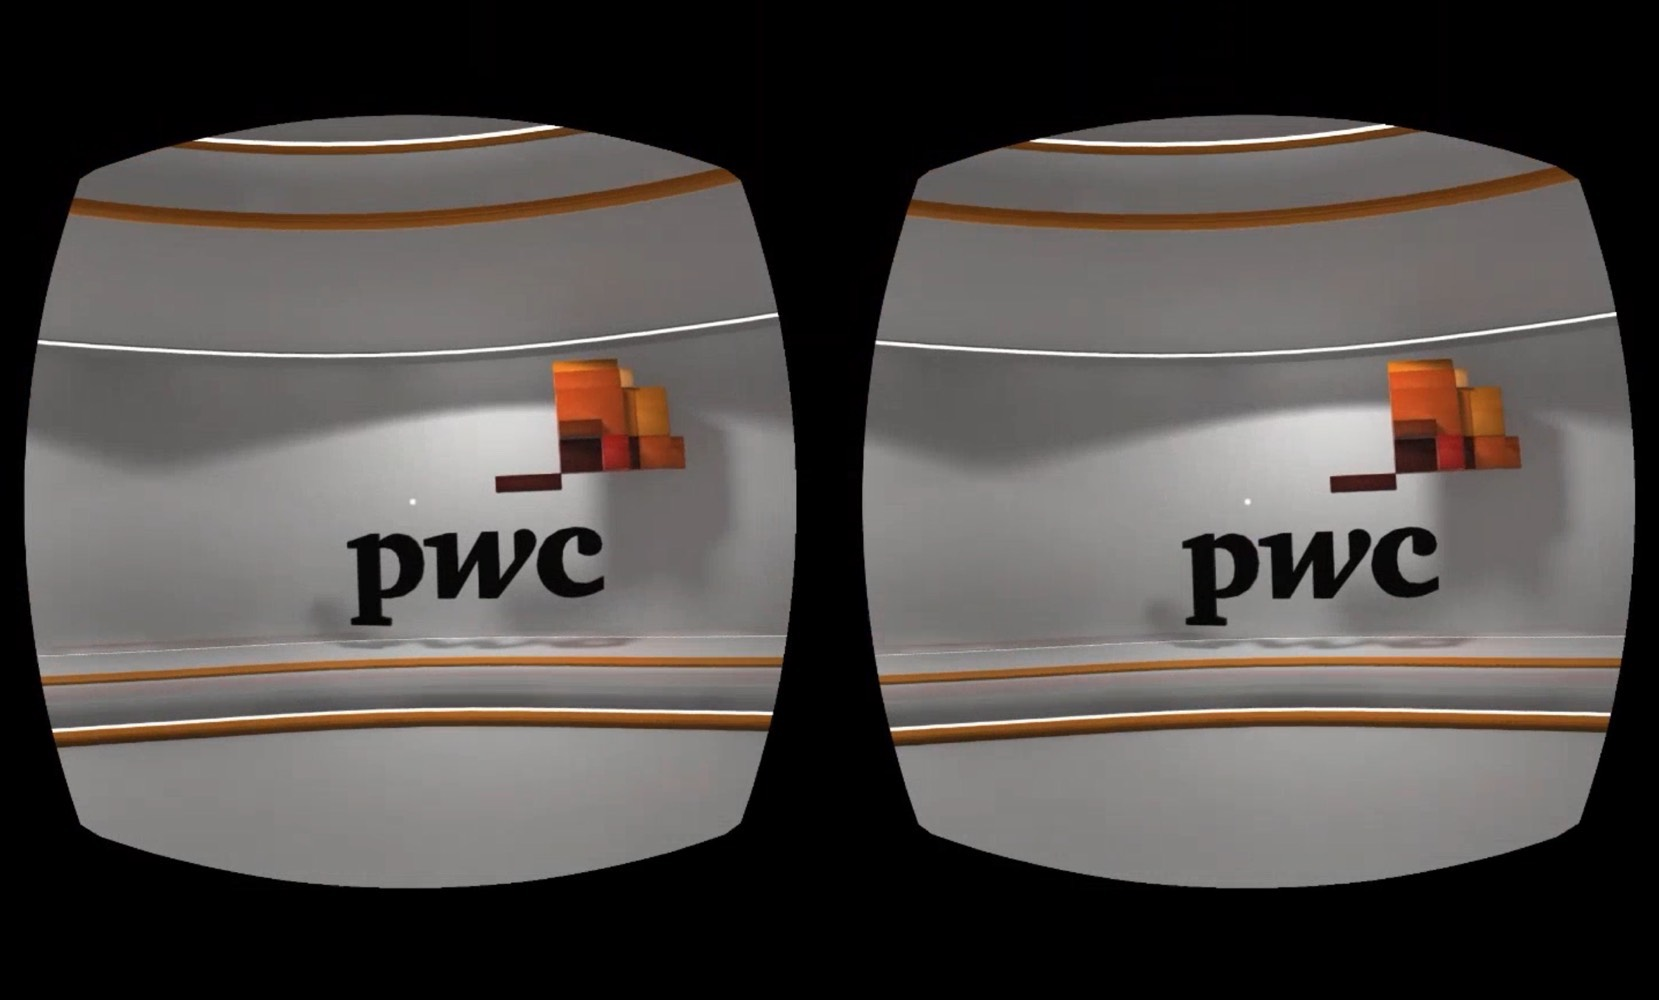 pwc-ar-vr-interactive-04